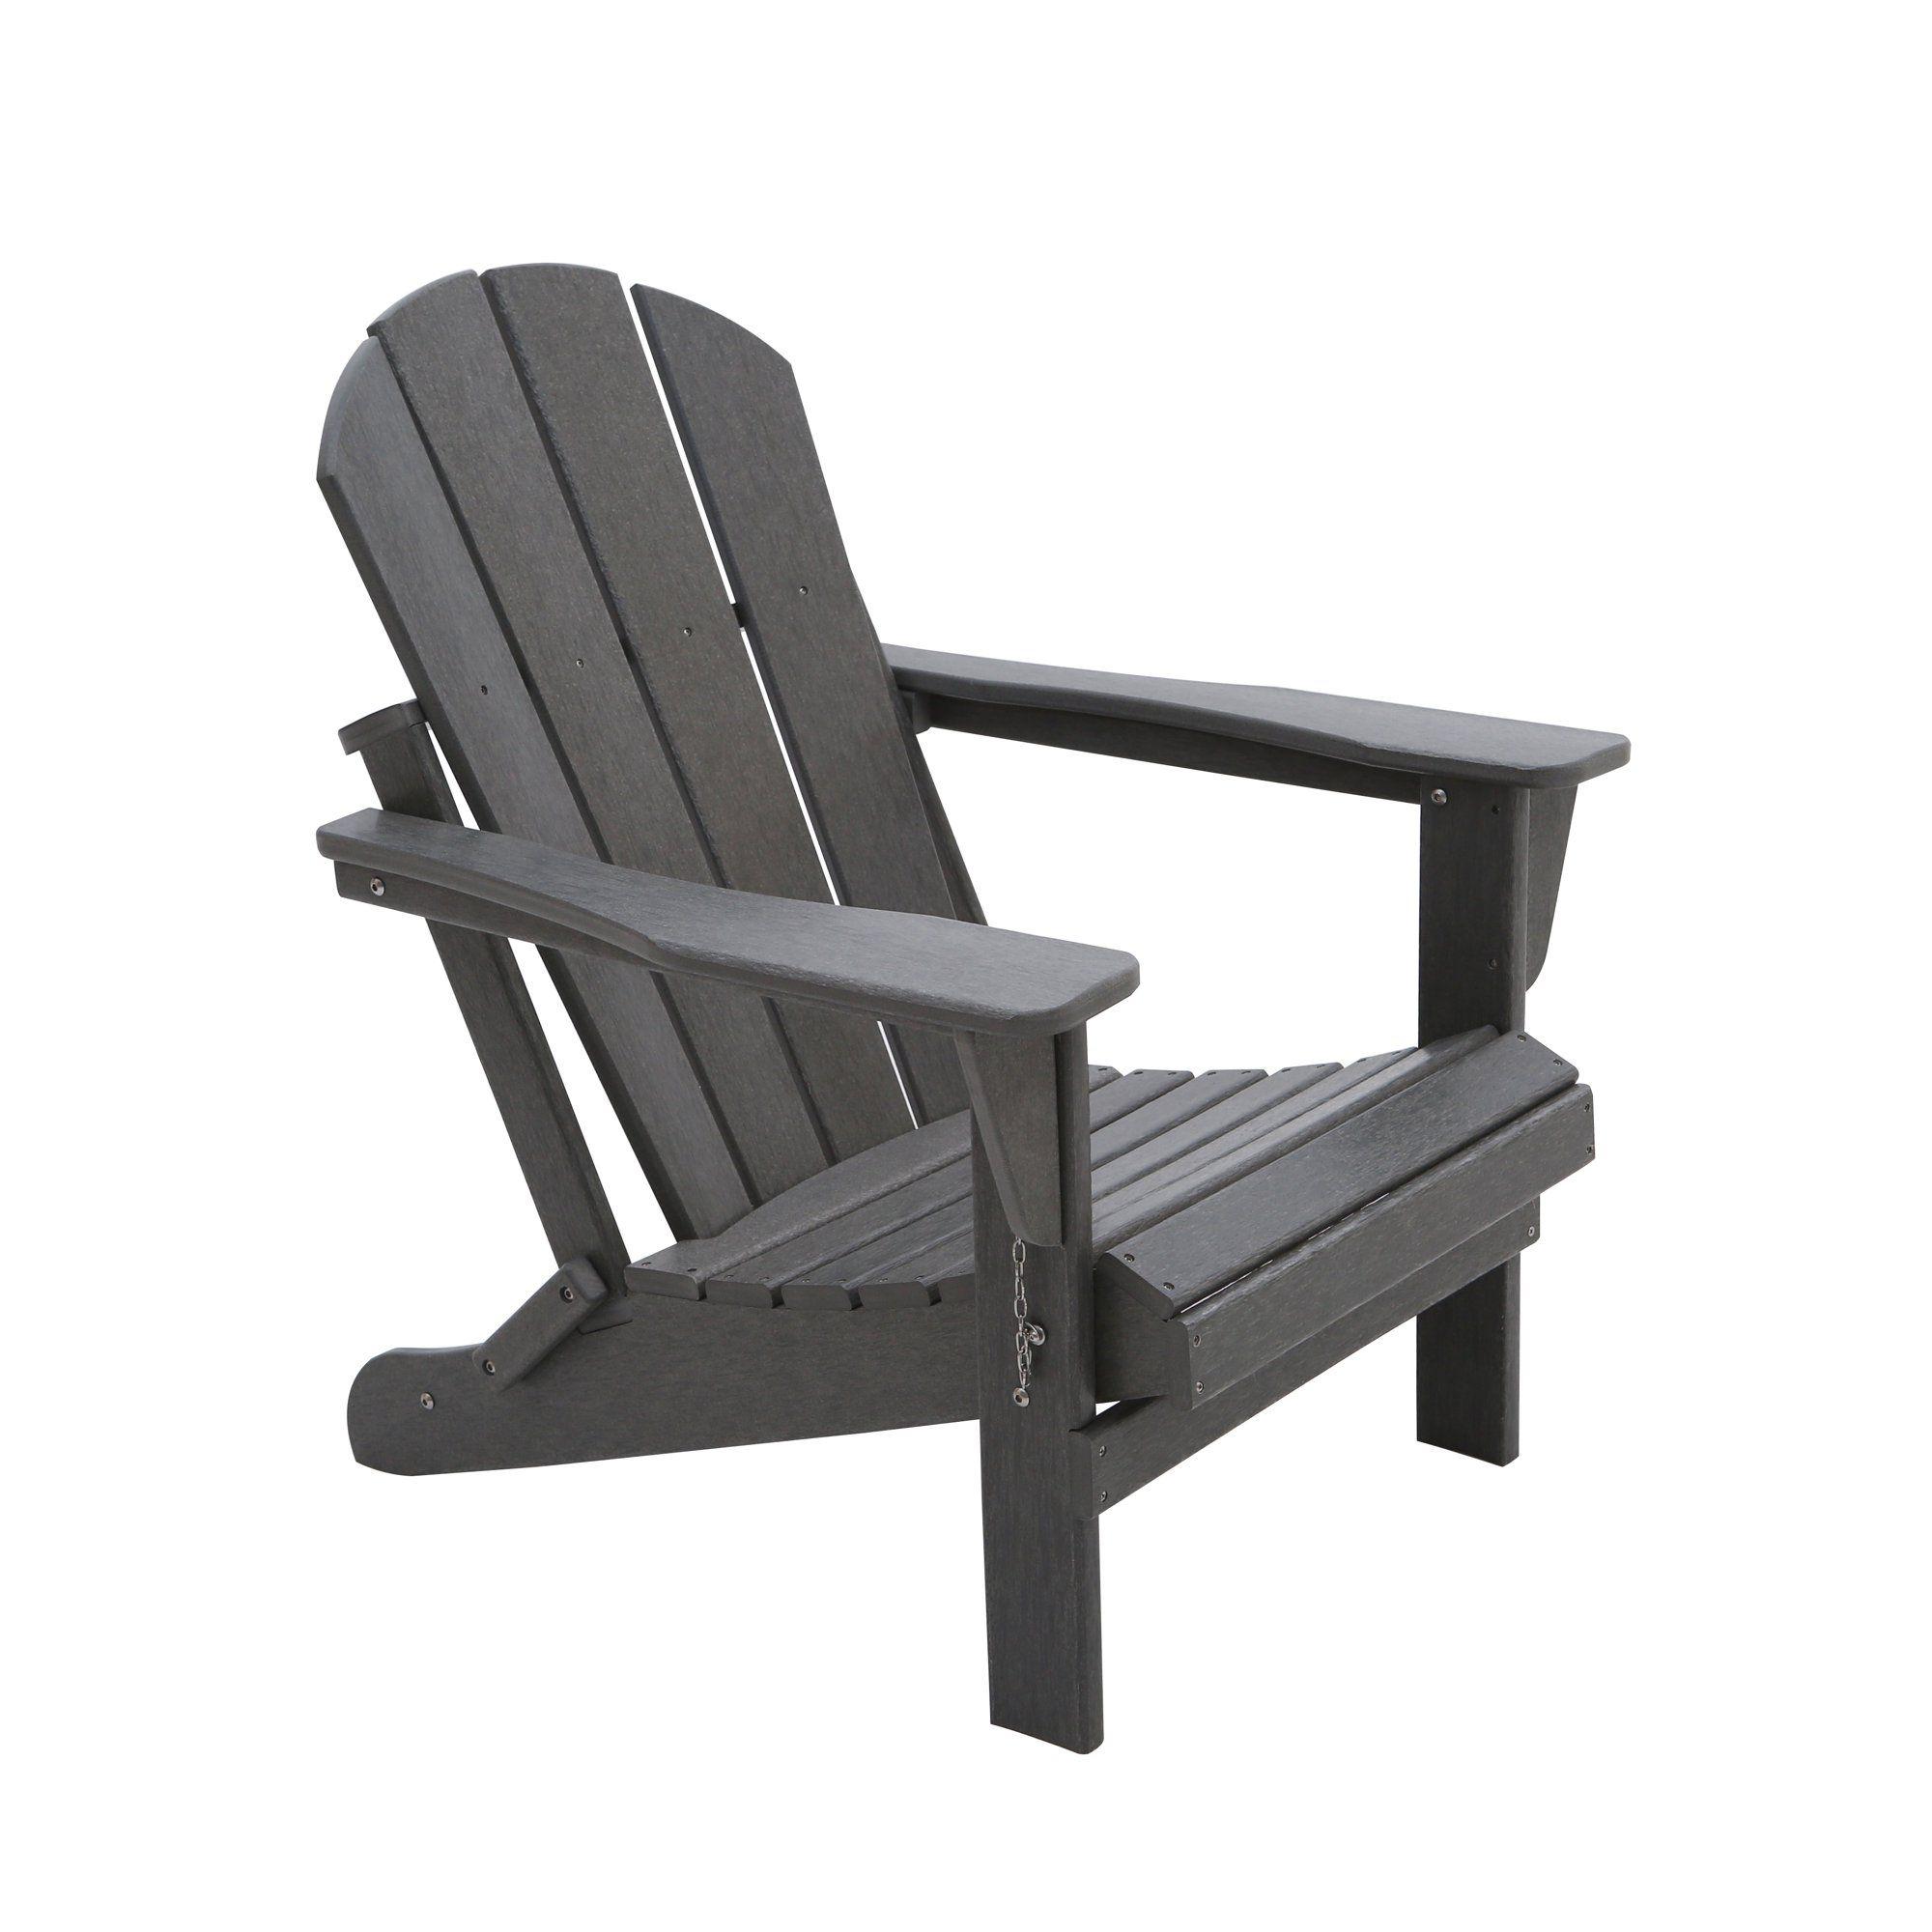 Braxton Outdoor Folding Poly Adirondack Chair Set Of 2 Gray Walmart Com Walmart Com In 2020 Folding Adirondack Chairs Adirondack Chair Adirondack Chairs Patio